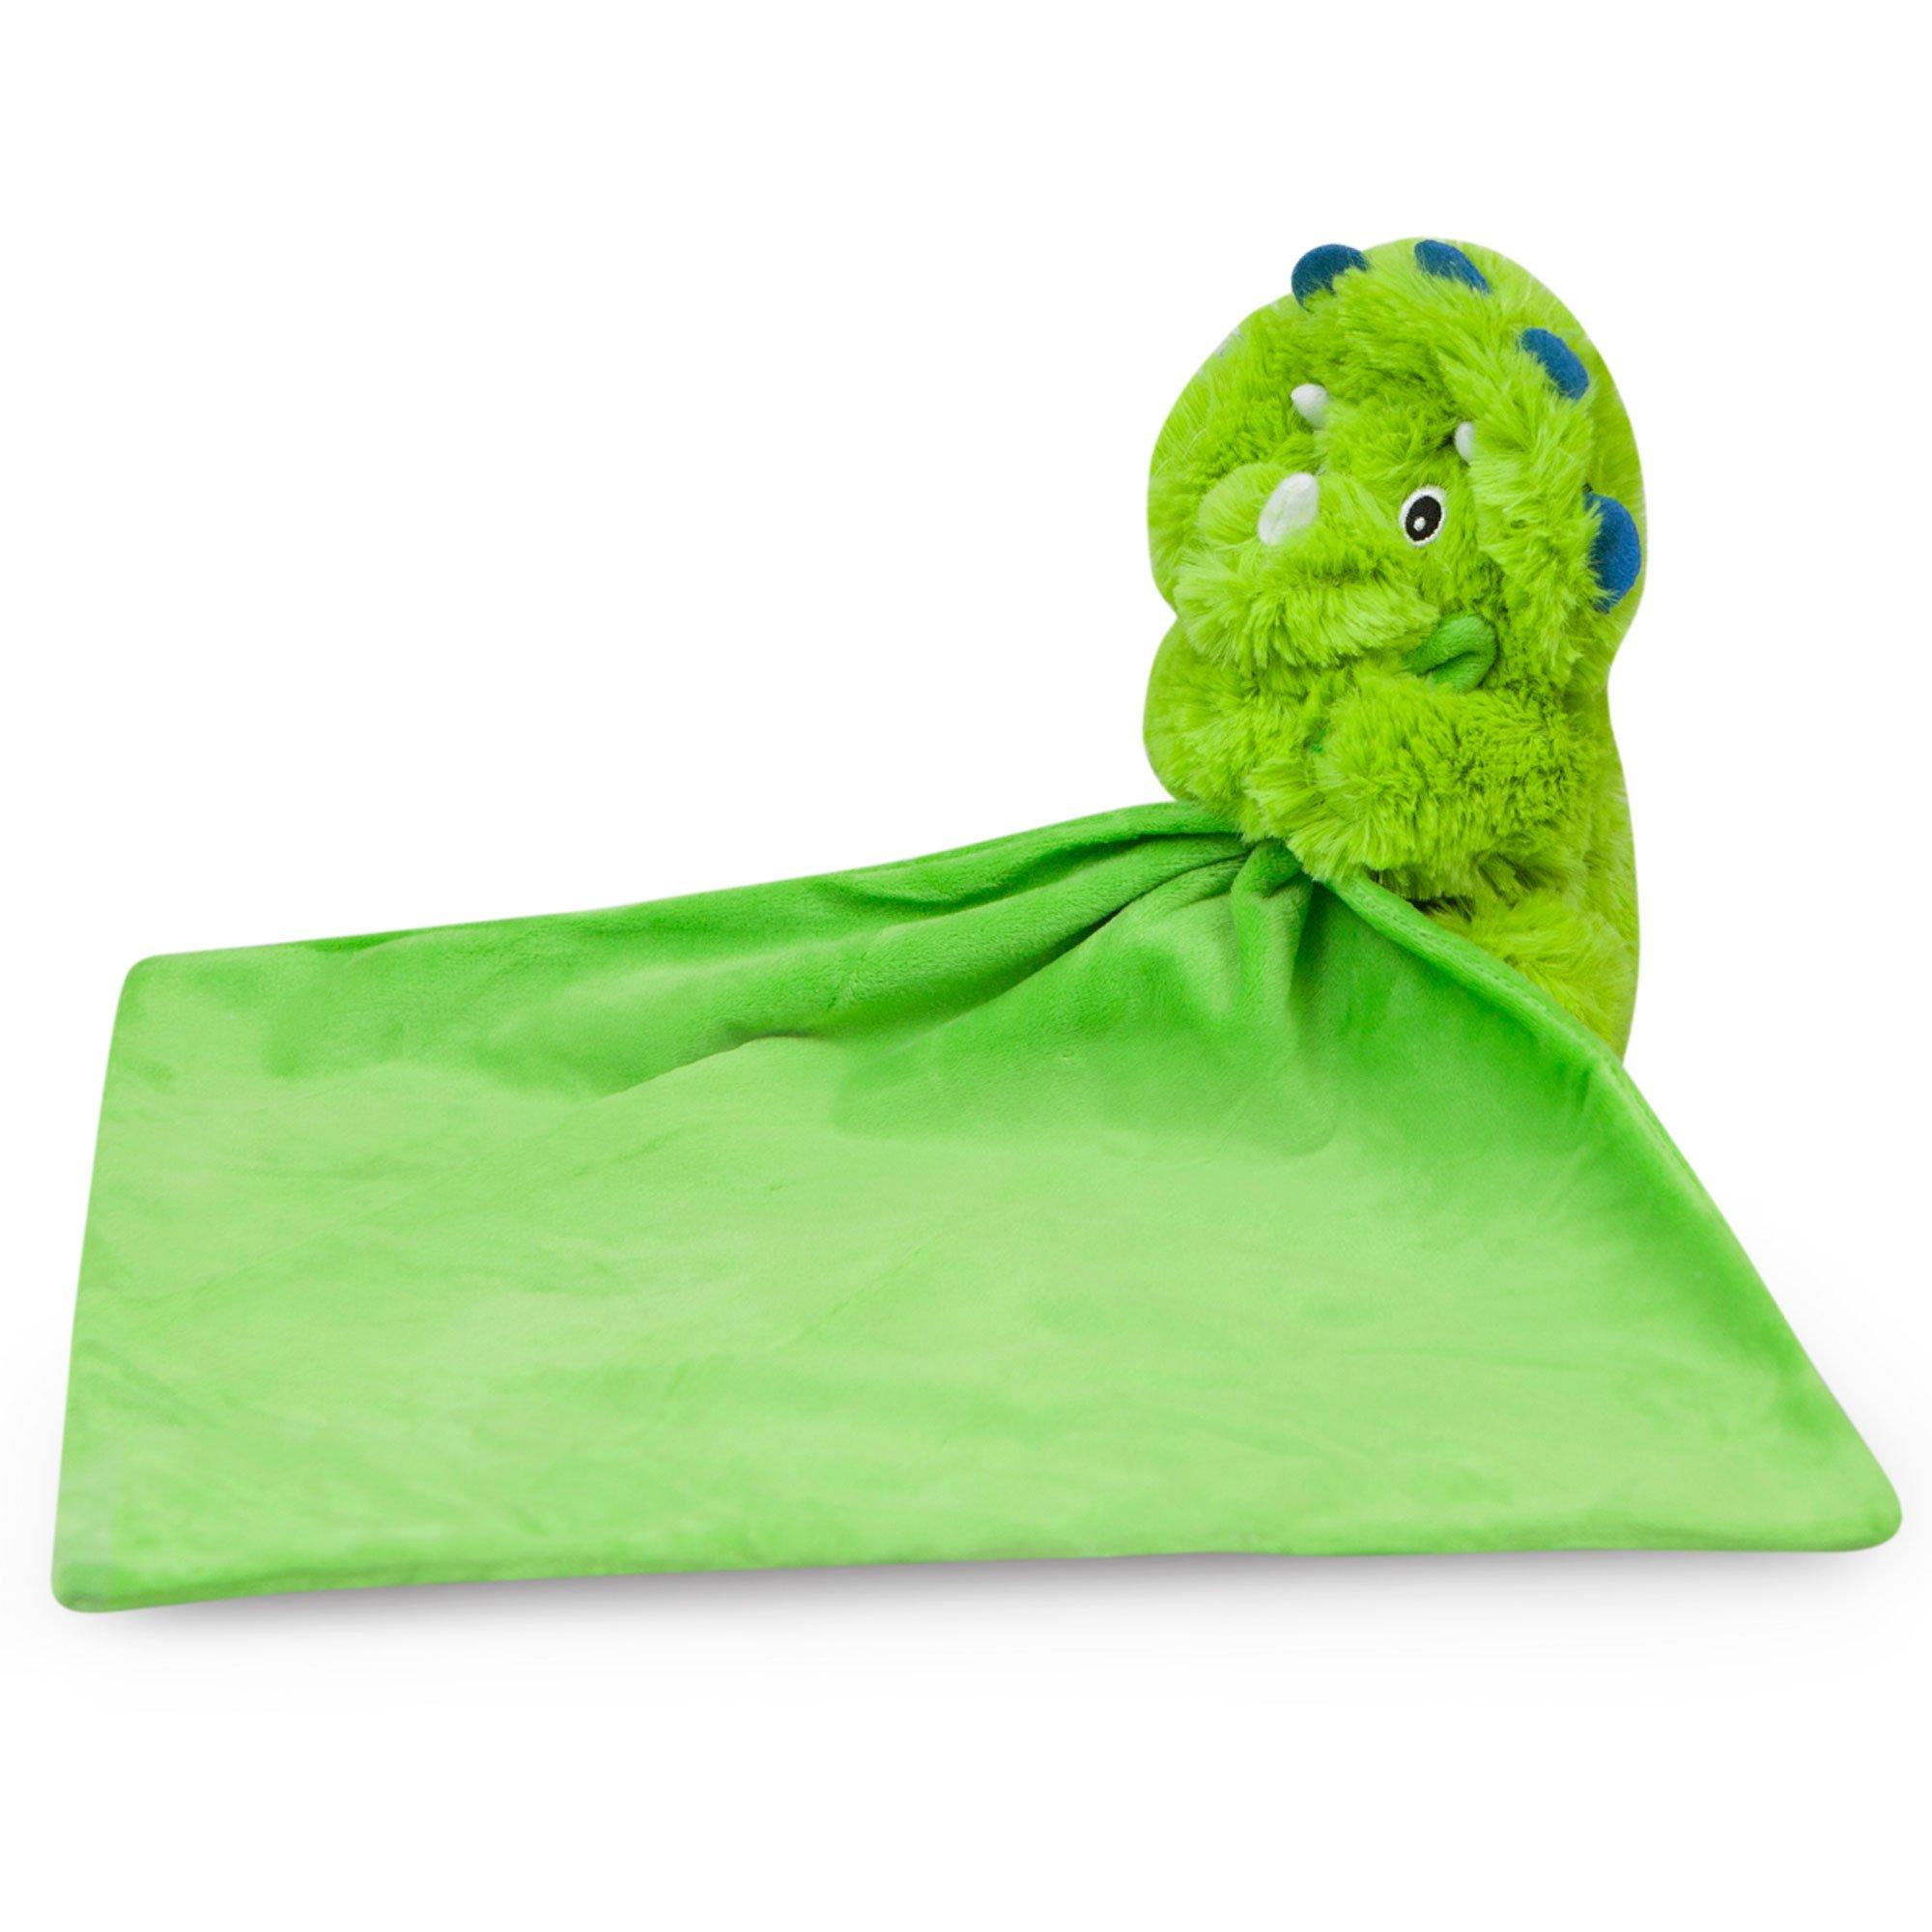 Waddle Rattle Dinosaur Toy Baby Blankie Stuffed Animal Security Blanket Dino Green